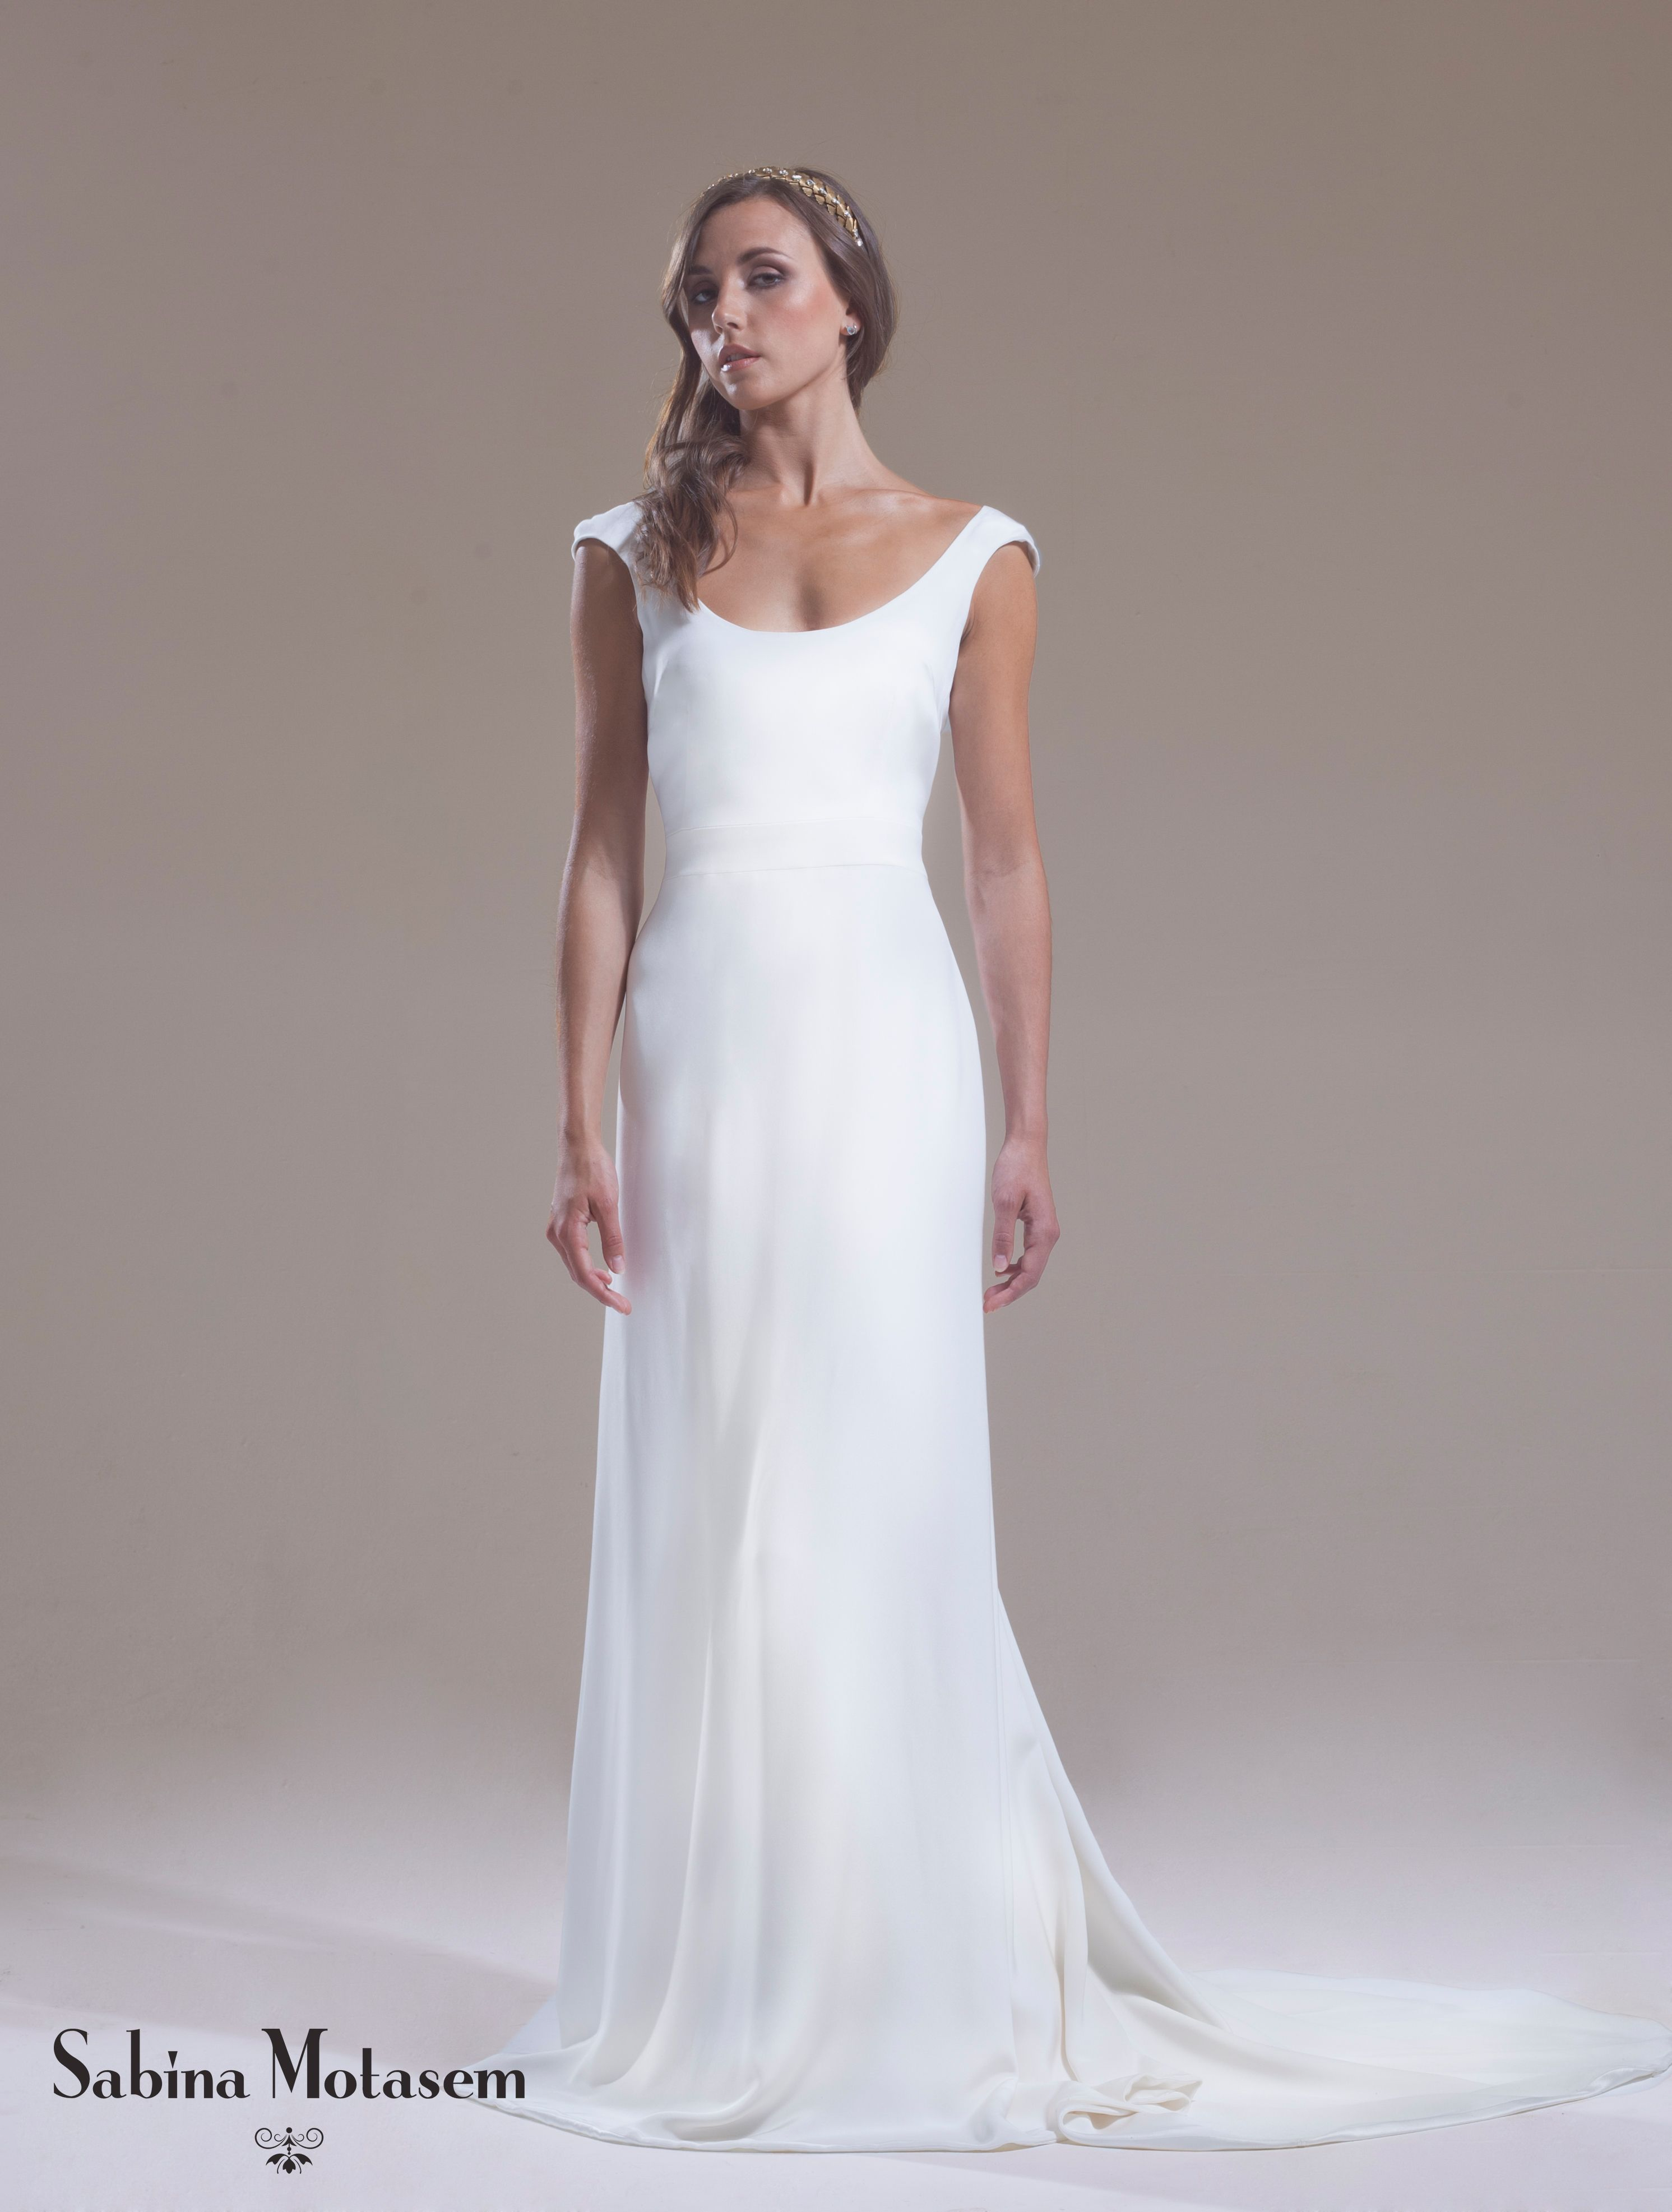 3ebf5df97a5 The Genevieve dress – Sabina Motasem. A bias cut